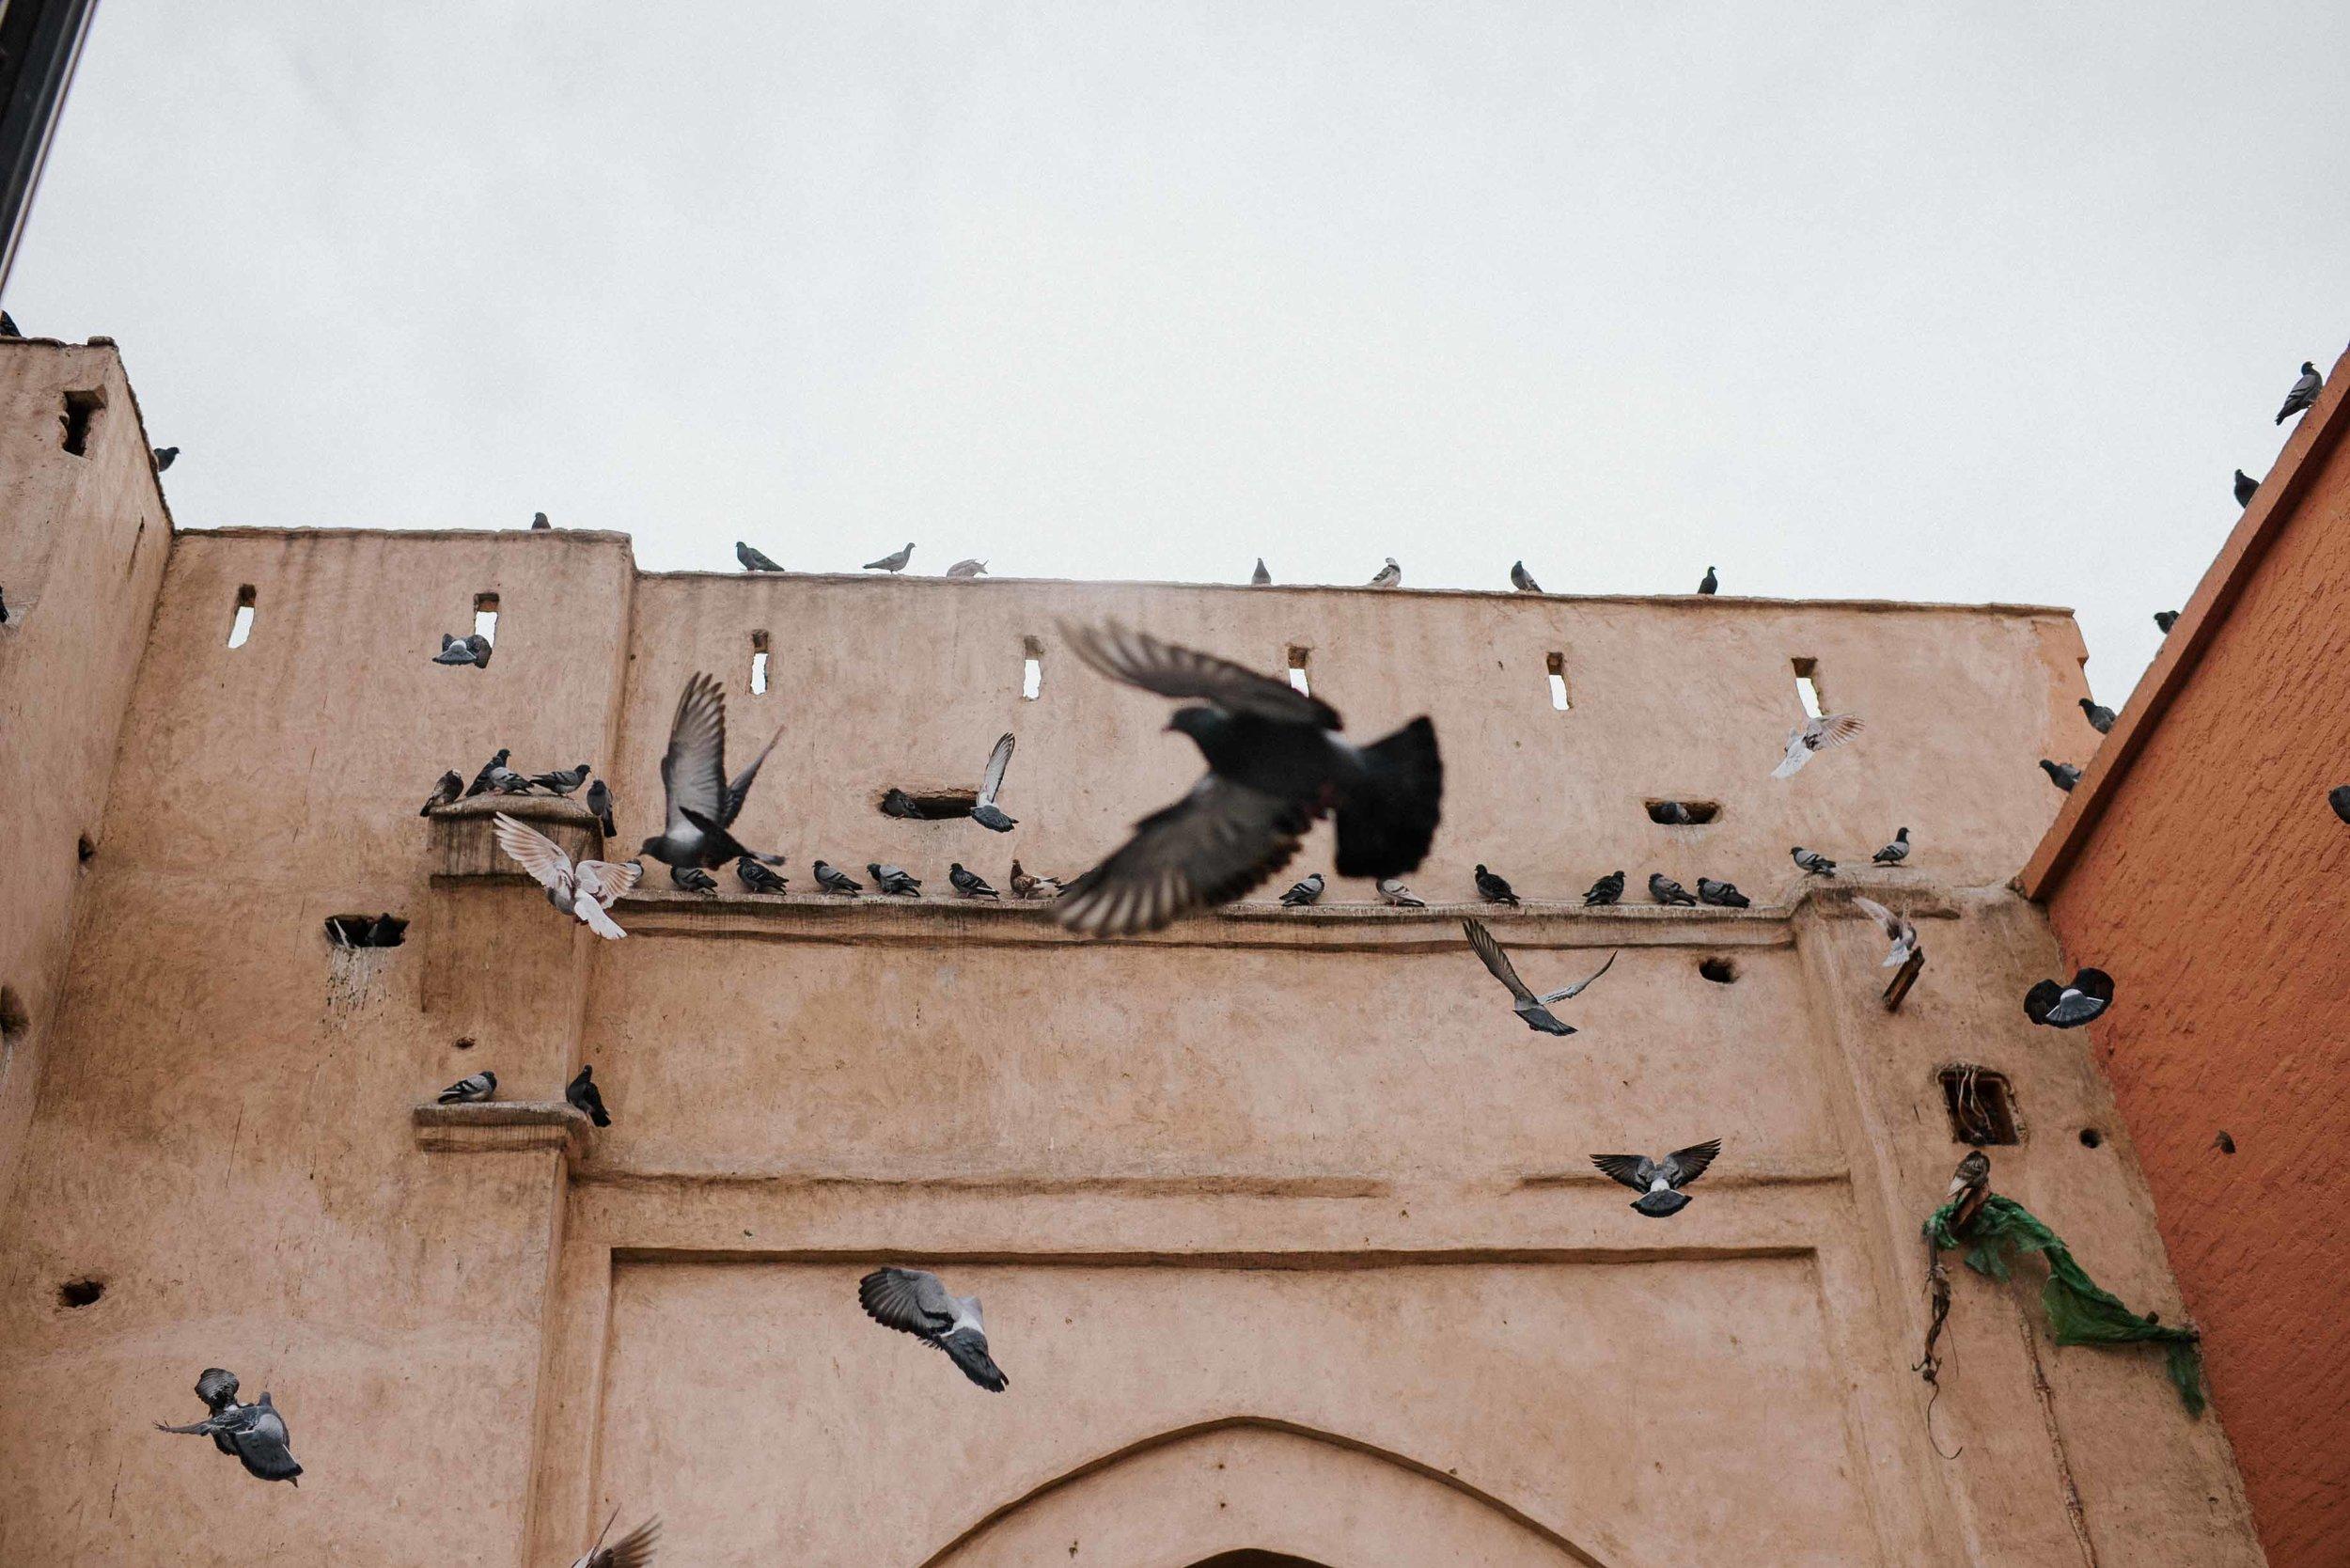 Morocco: perfect location for a destination wedding